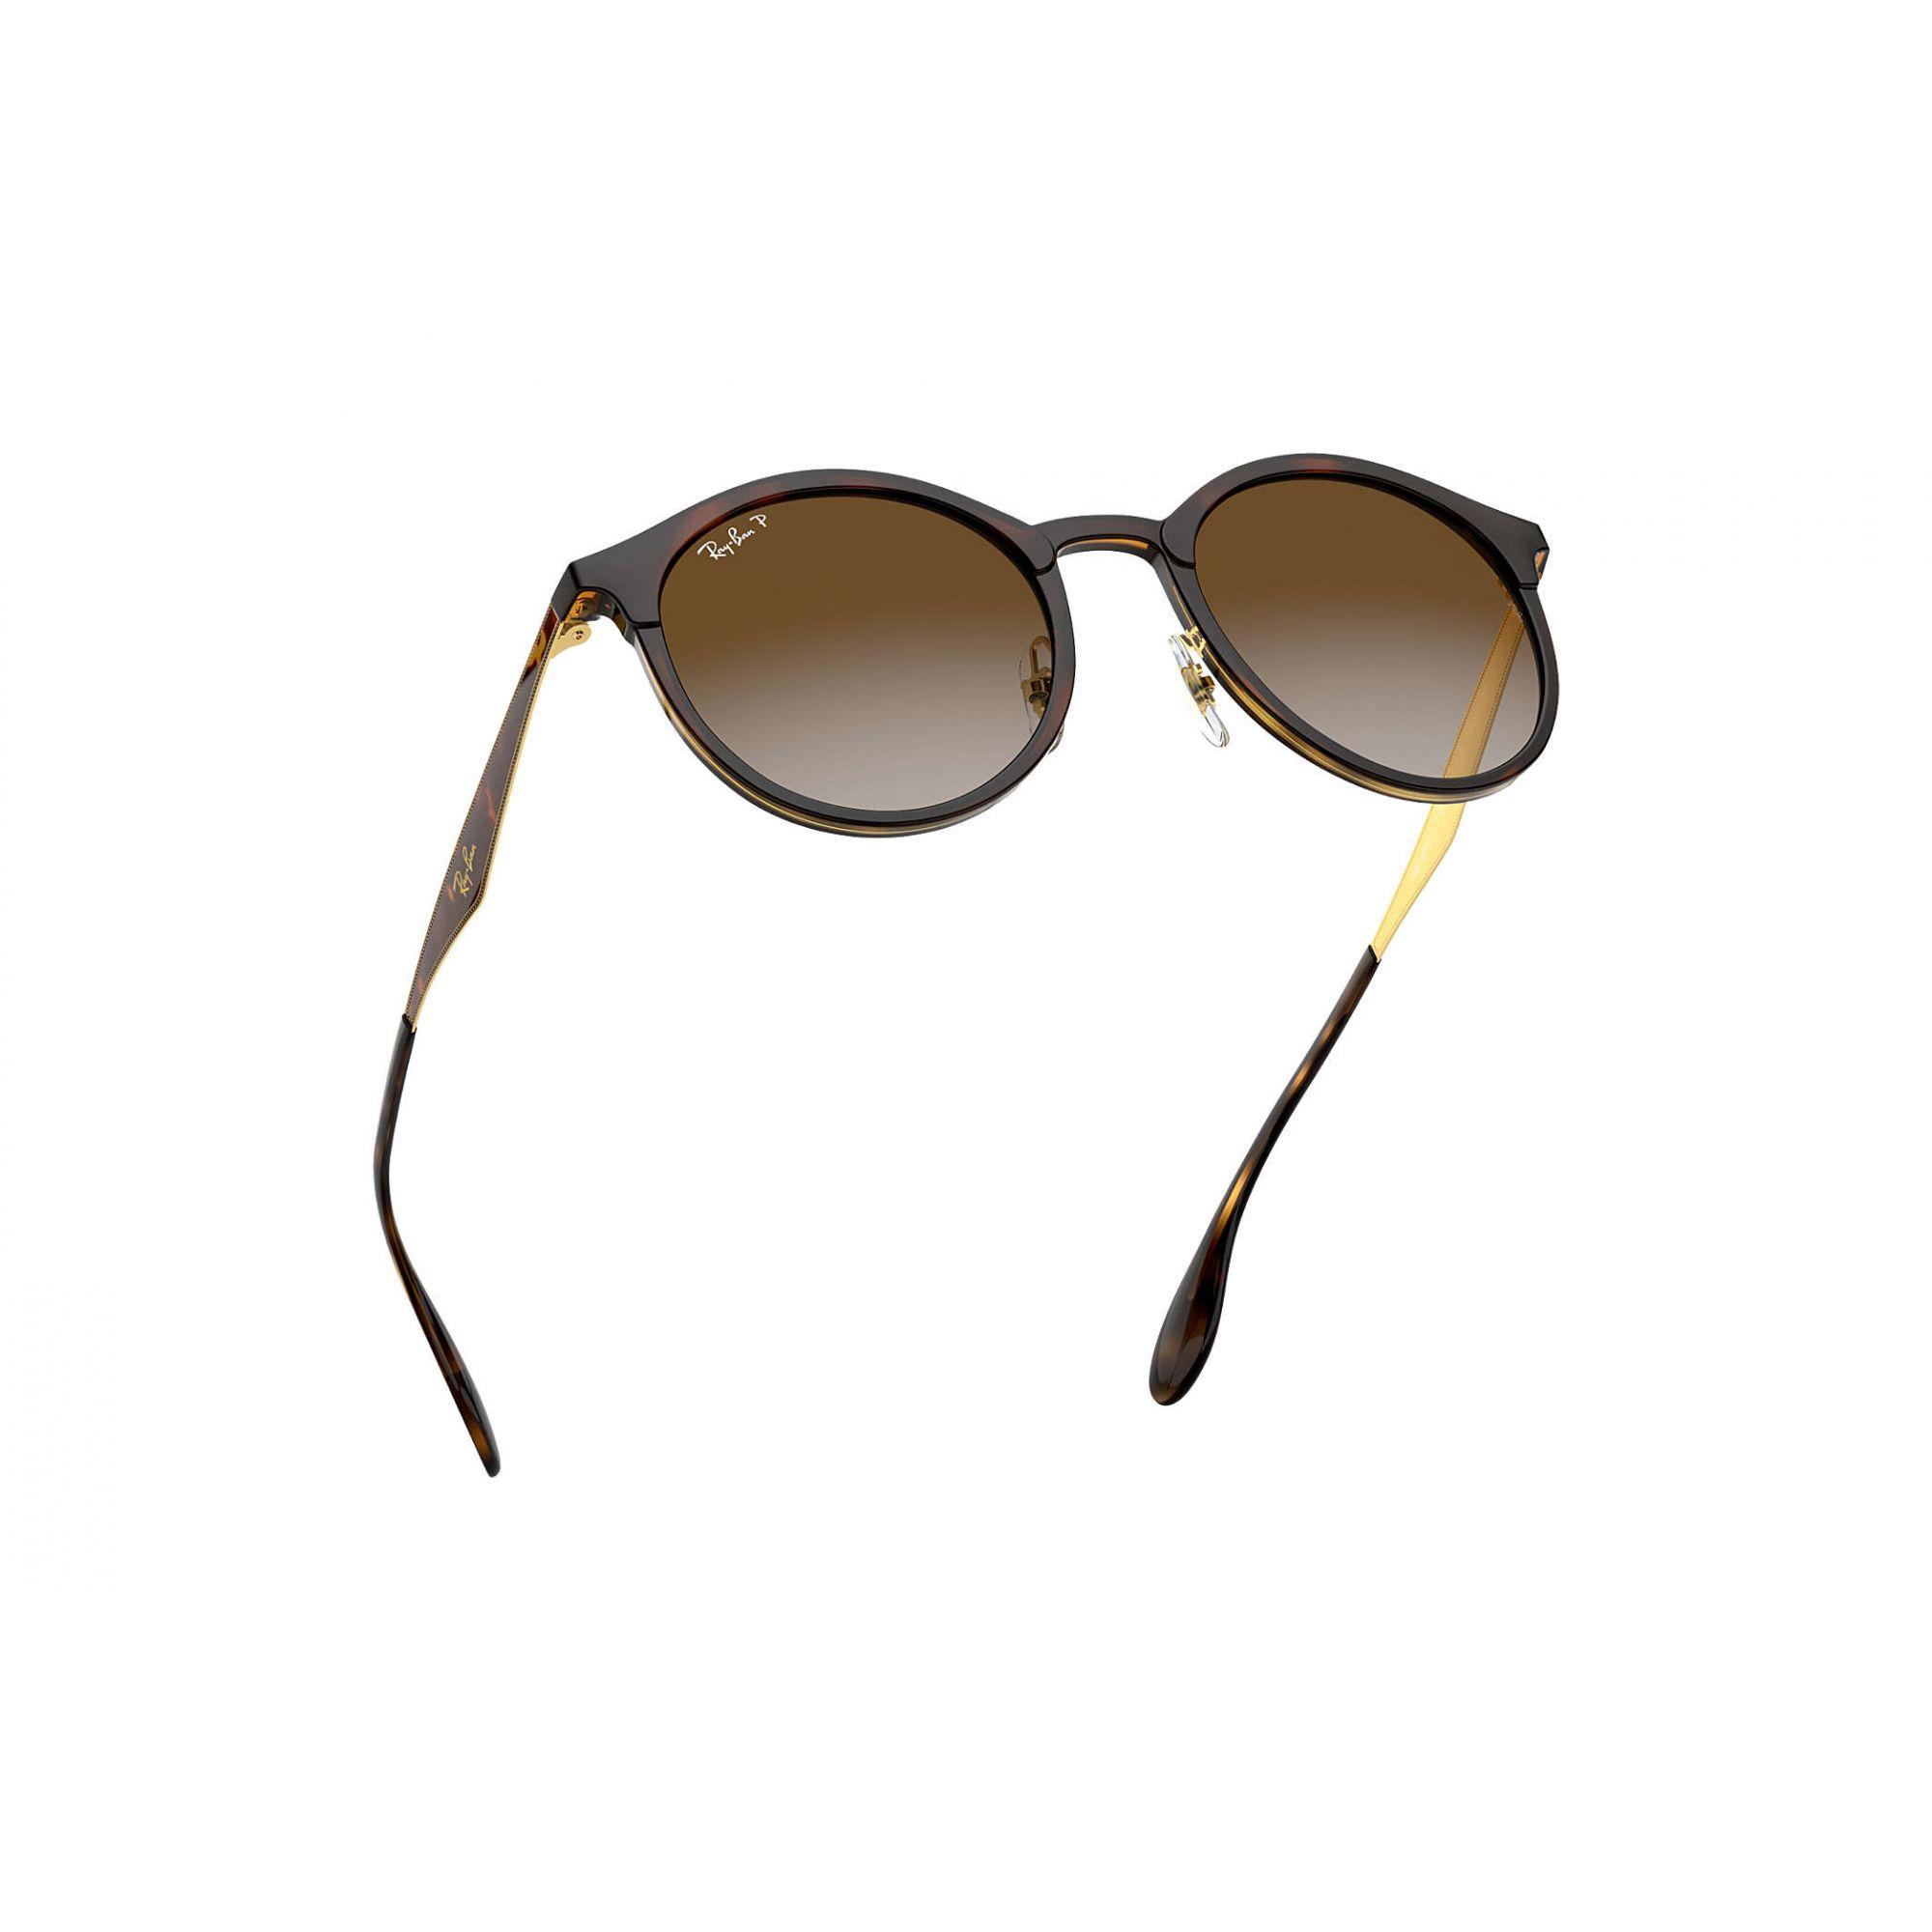 Ray Ban - RB4277 710T551 - Óculos de sol